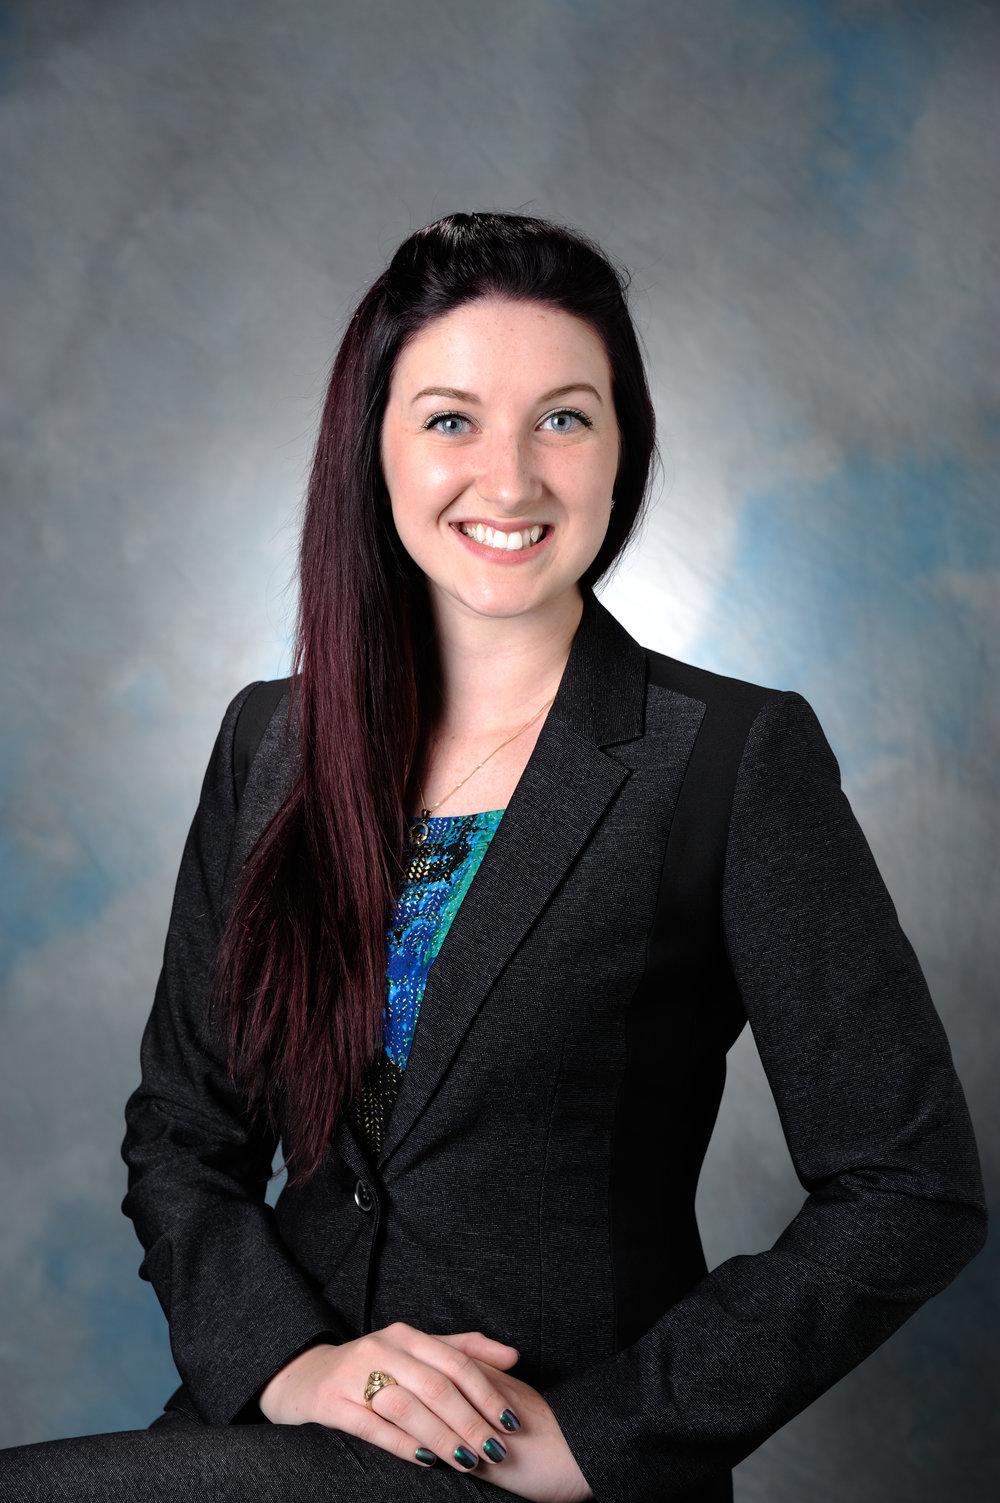 Anna Cantwell (P3) - LAPPE Program '18-'19Rho Chi MemberSCCP President '17-'18; President-Elect '16-'17PLS Secretary '17-'18c/o 2019 Secretary '15-'16; '16-'17; '17-'18SNPhA Spring Health Fair Co-Coordinator '16